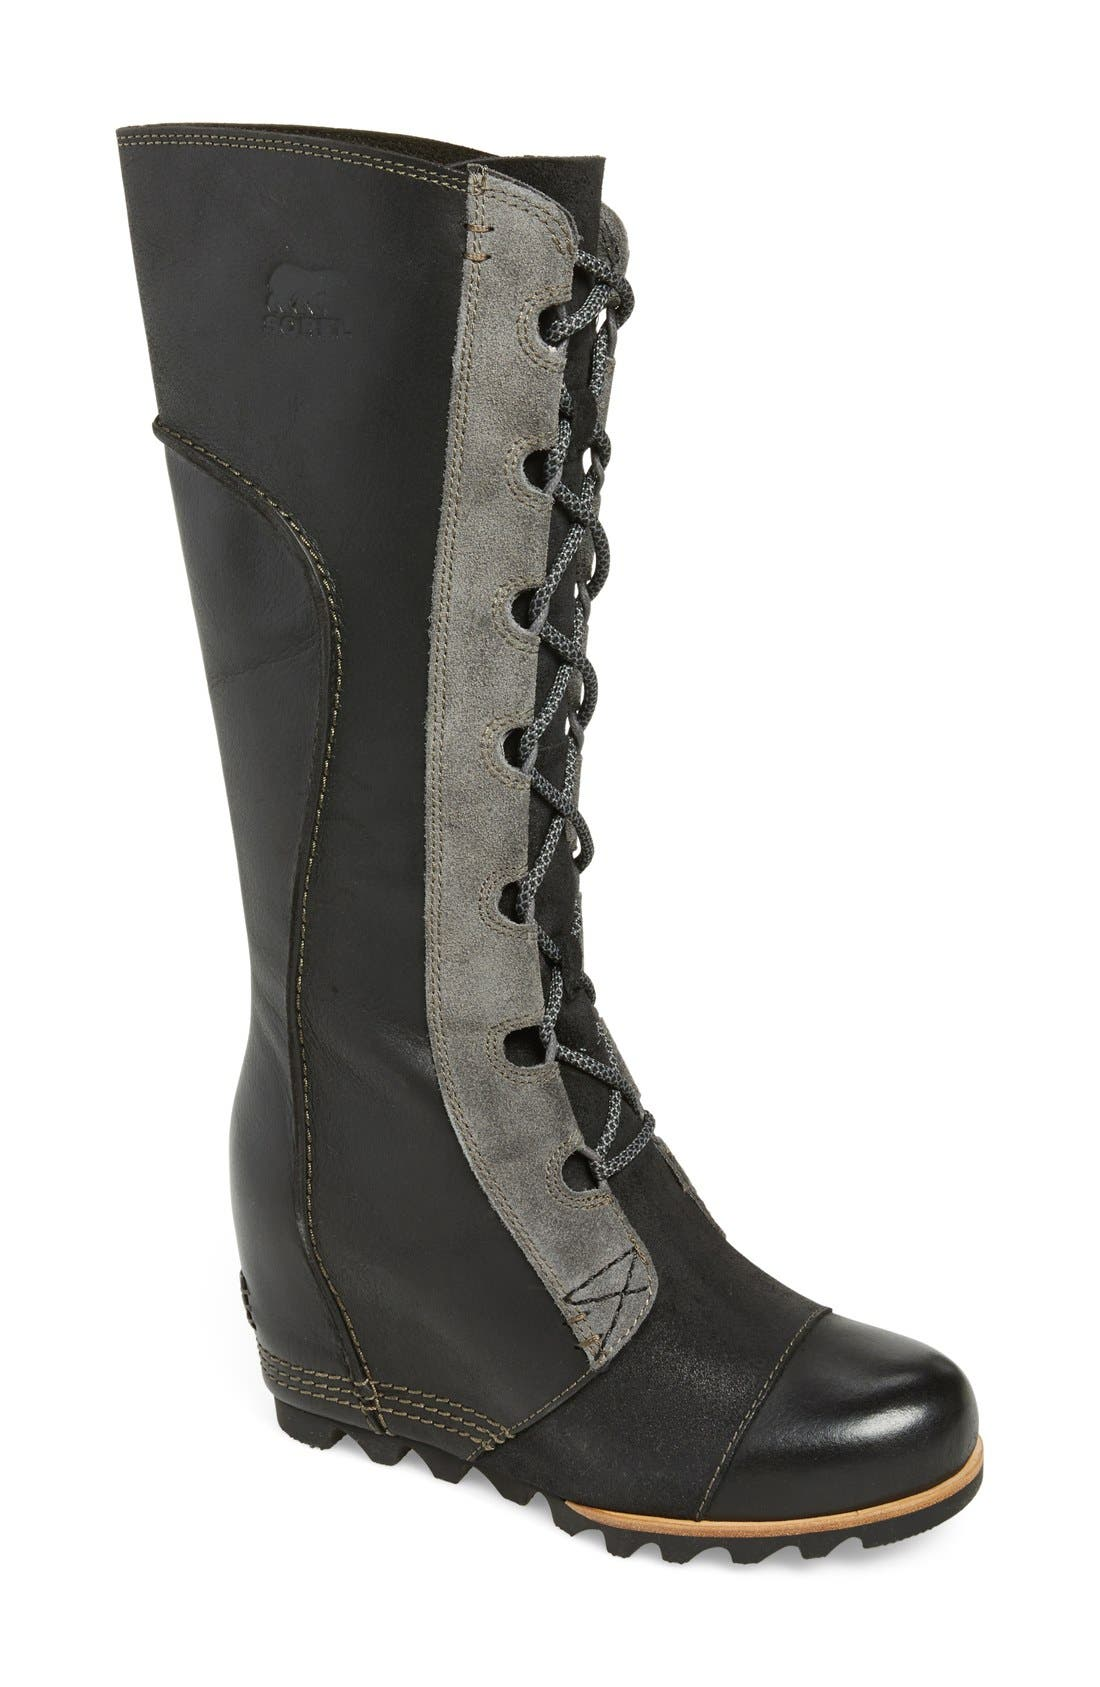 SOREL 'Cate the Great' Waterproof Wedge Boot, Main, color, 010